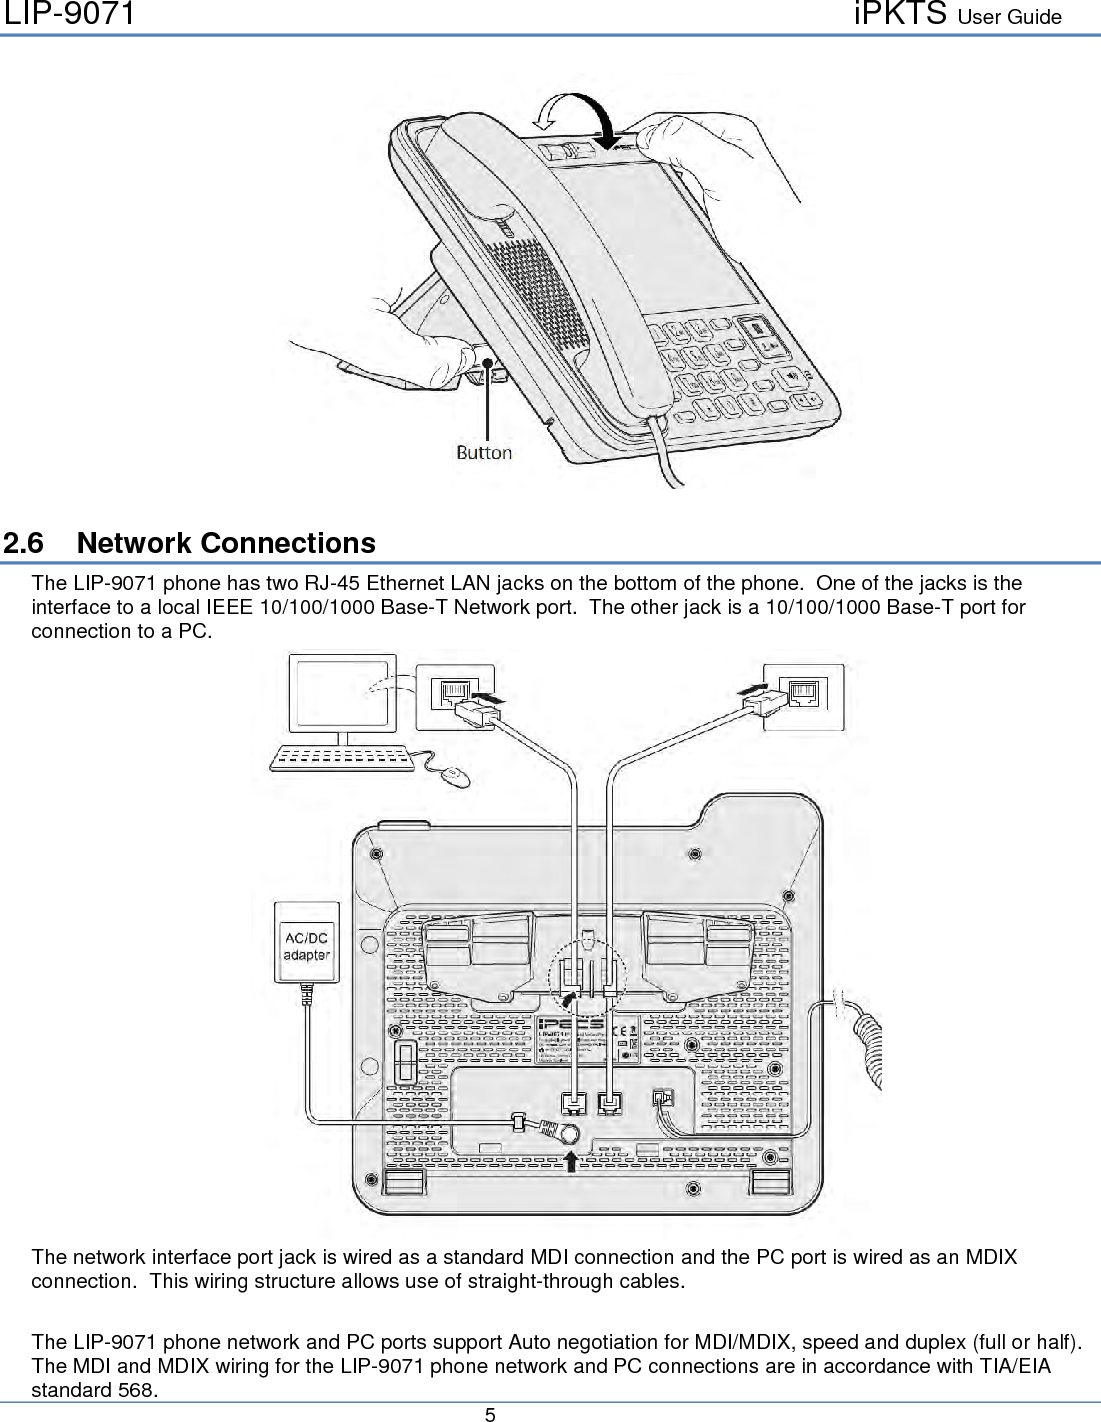 Ericsson Lg Enterprise Lip9071 Ip Gigabit Video Phone User Manual Lan Jack Wiring Lip 9071 Ipkts Guide 5 26 Network Connections The Has